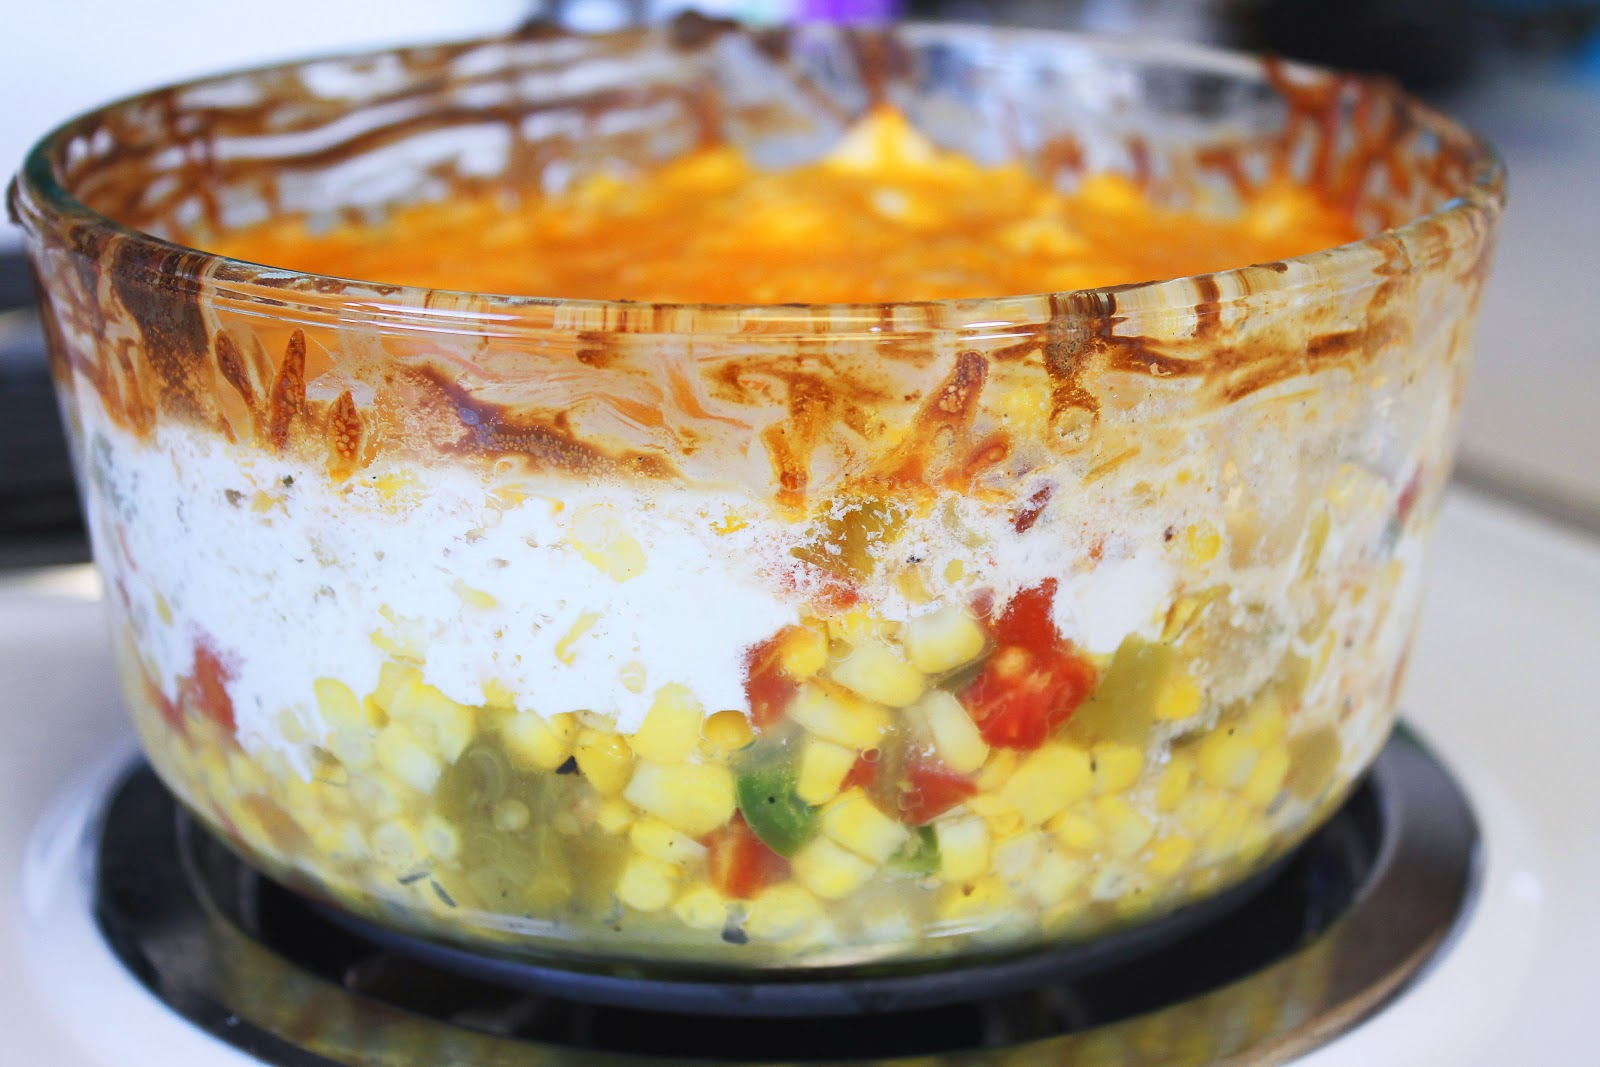 Fritos Corn Dip Creamy Baked Corn Dip